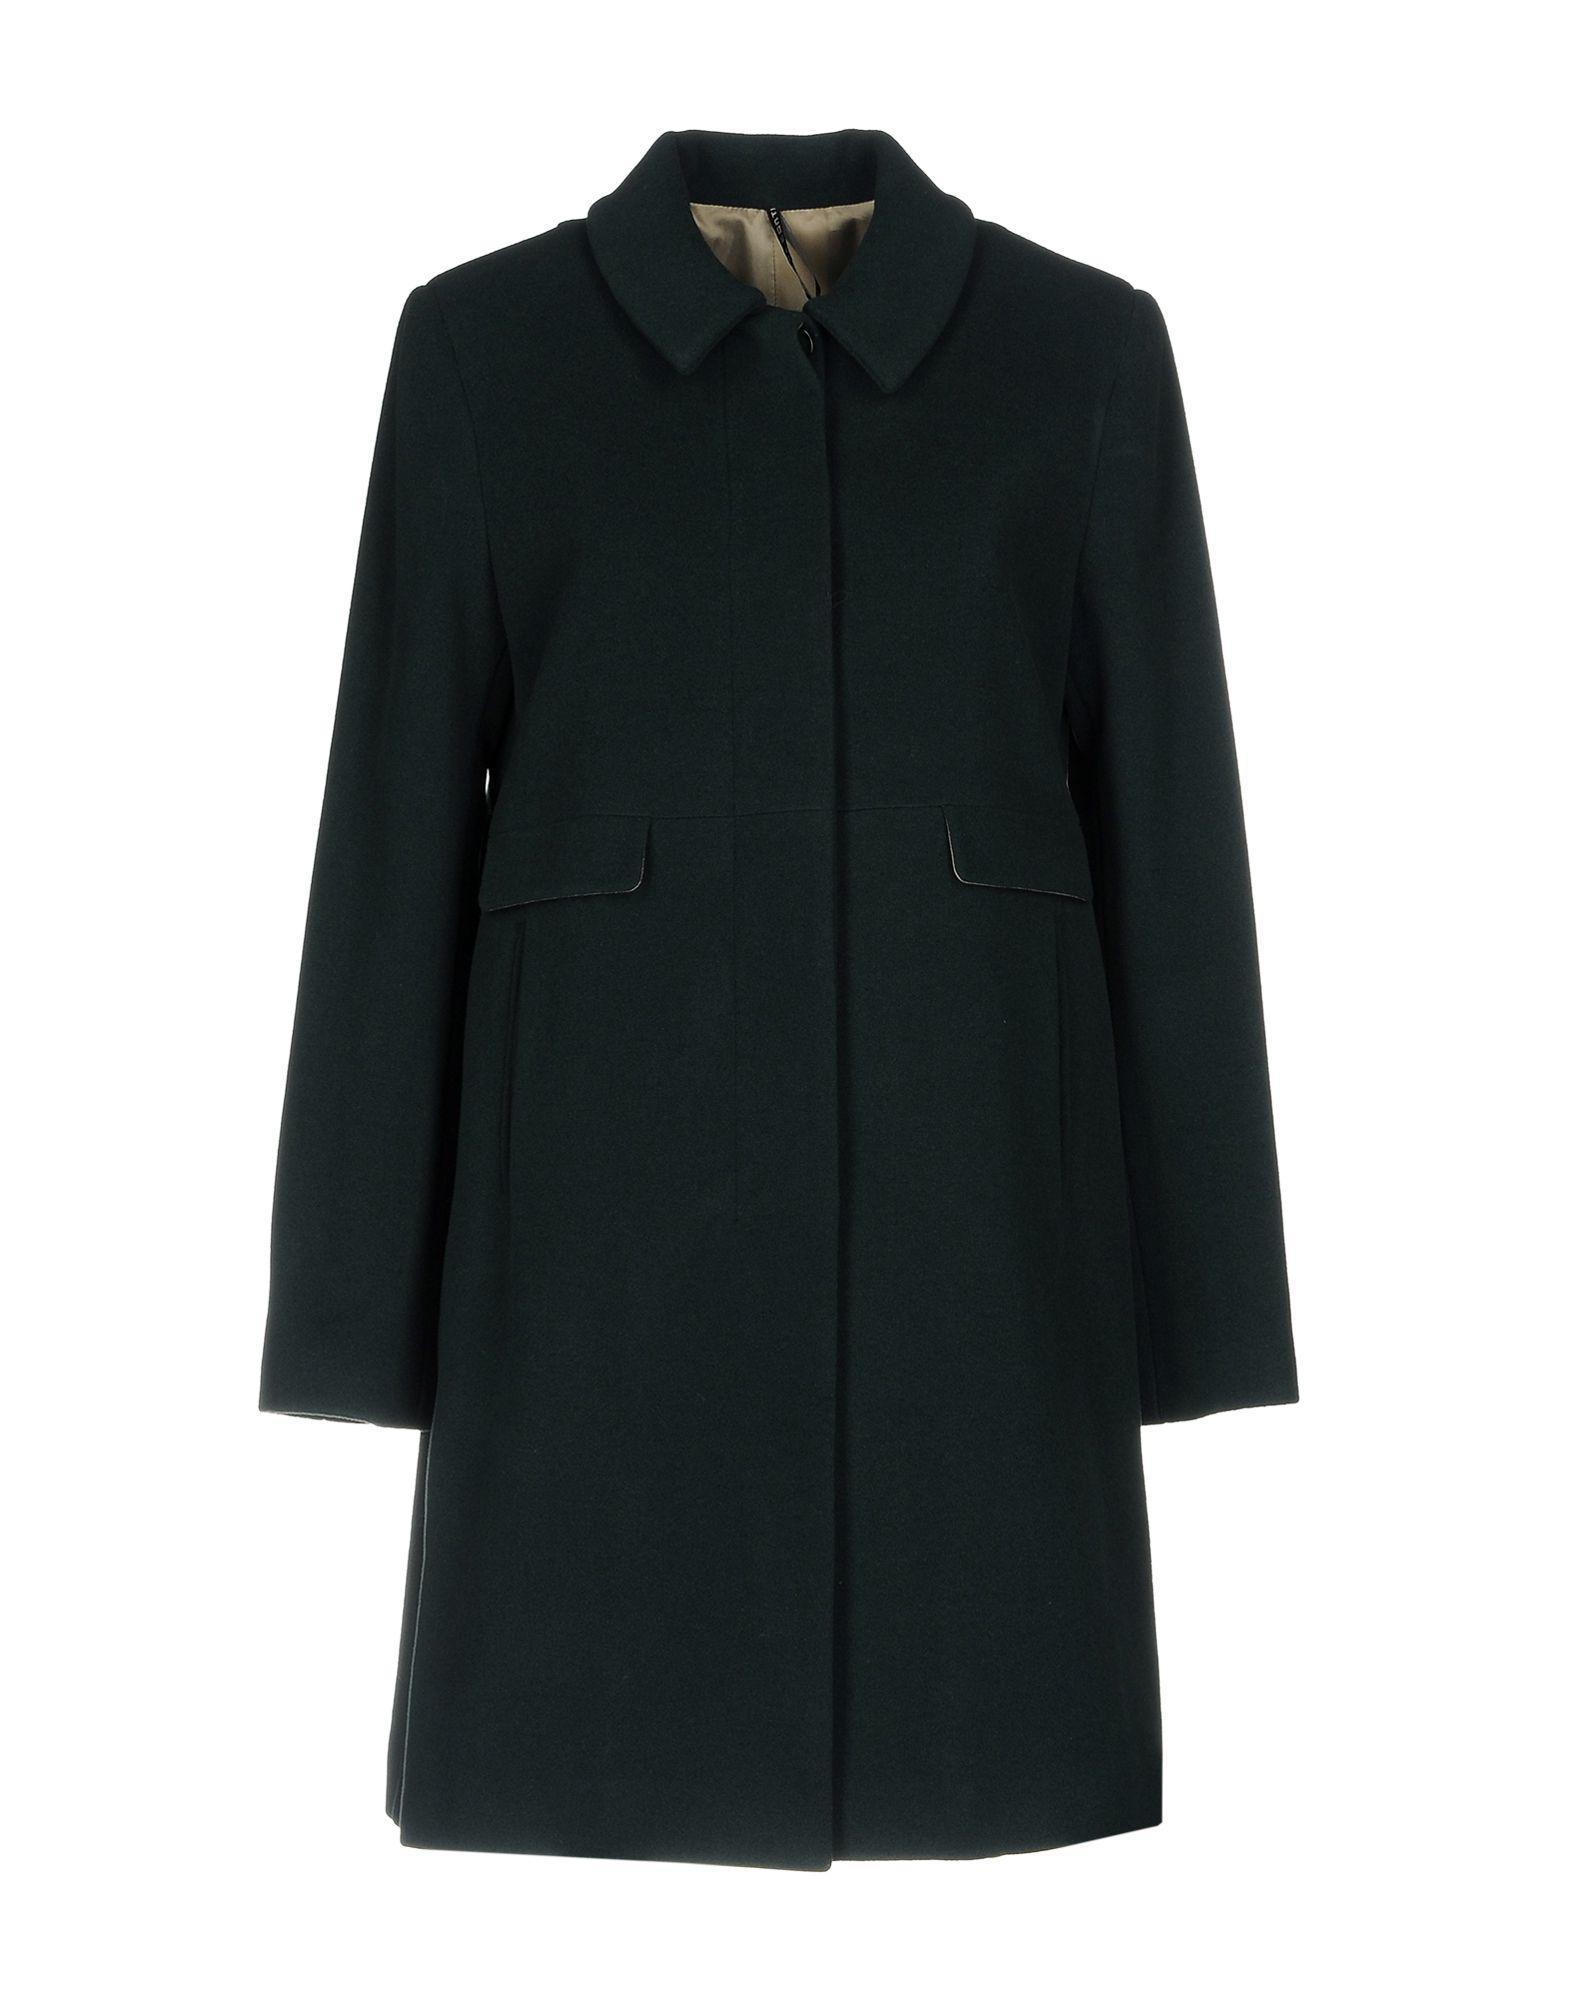 Liviana Conti Coats In Green